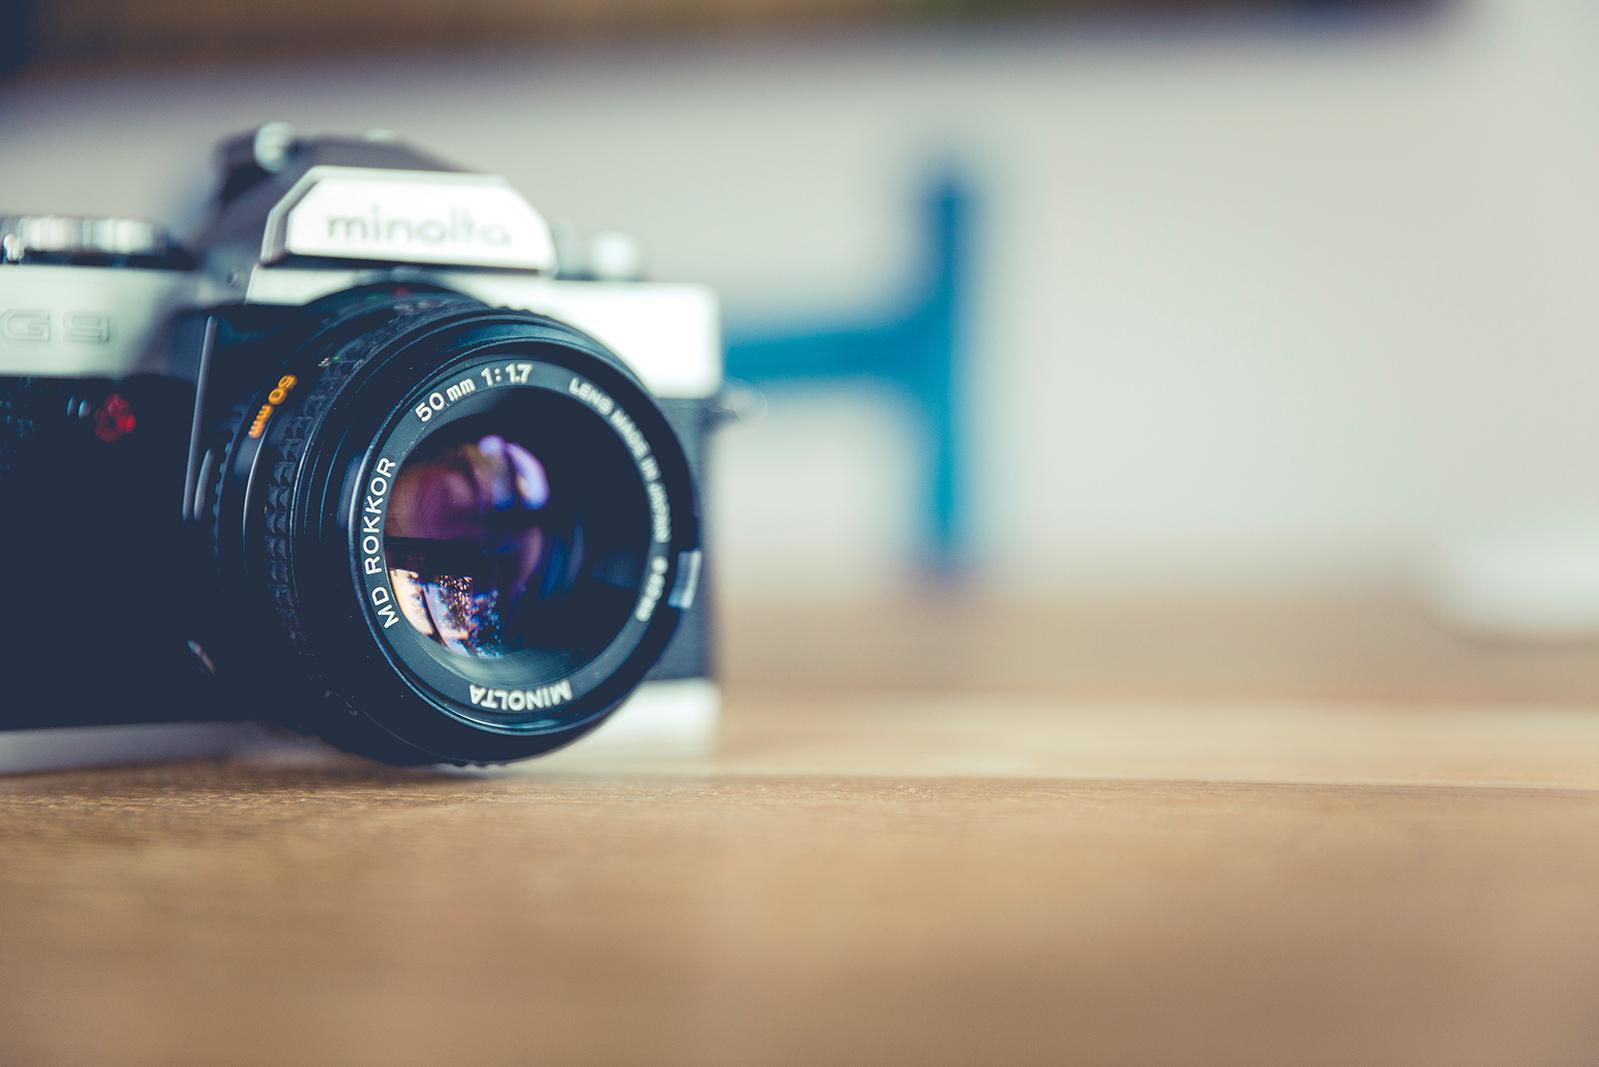 JACdigital photography competition – Sem 2, 2019